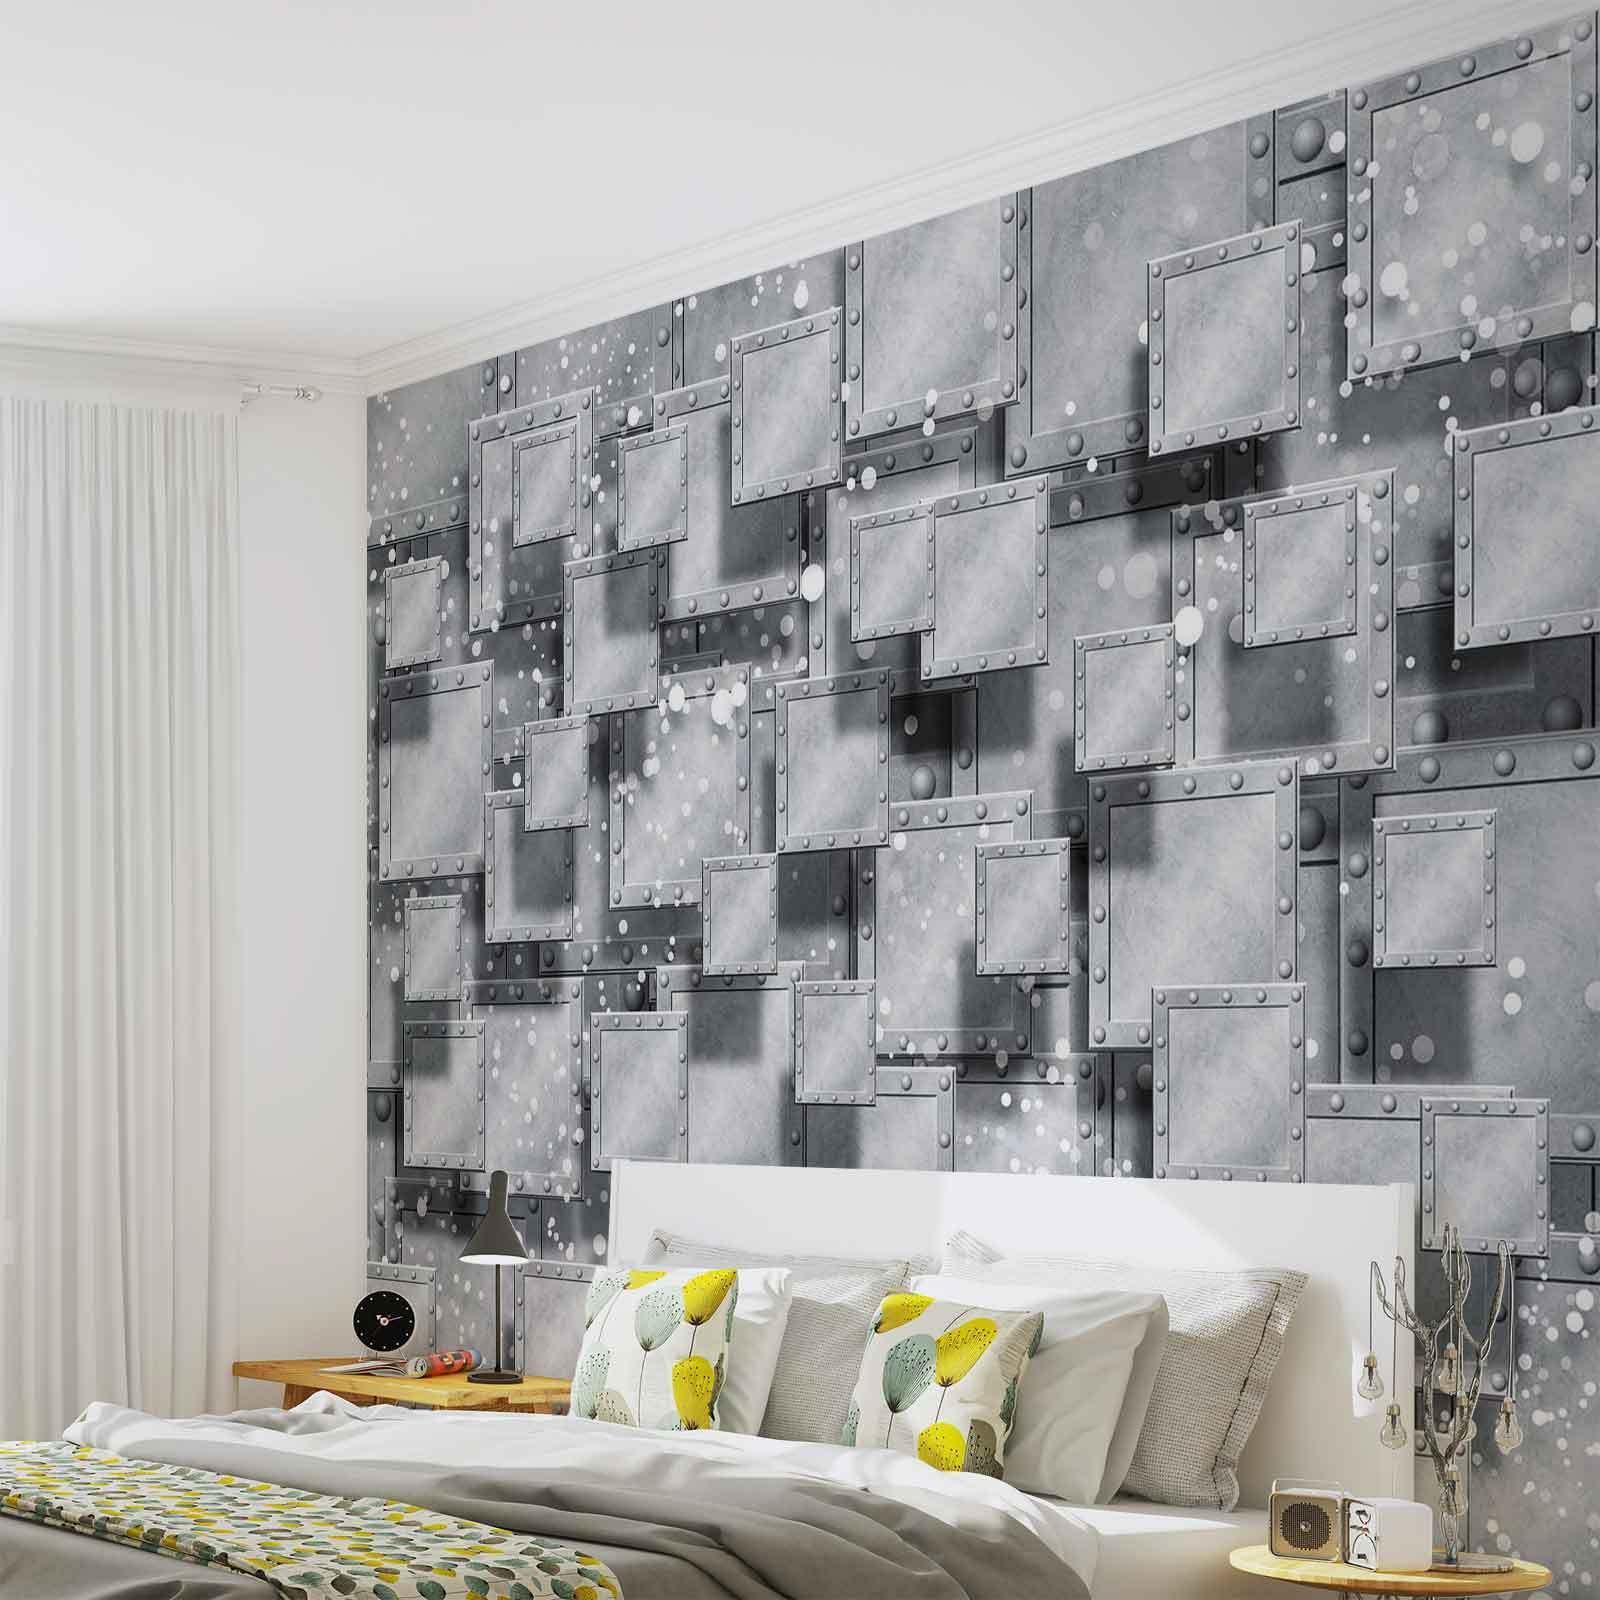 VLIES FOTOTAPETE Abstrakt Modern Grau Silber  TAPETE MURAL (3029FW)